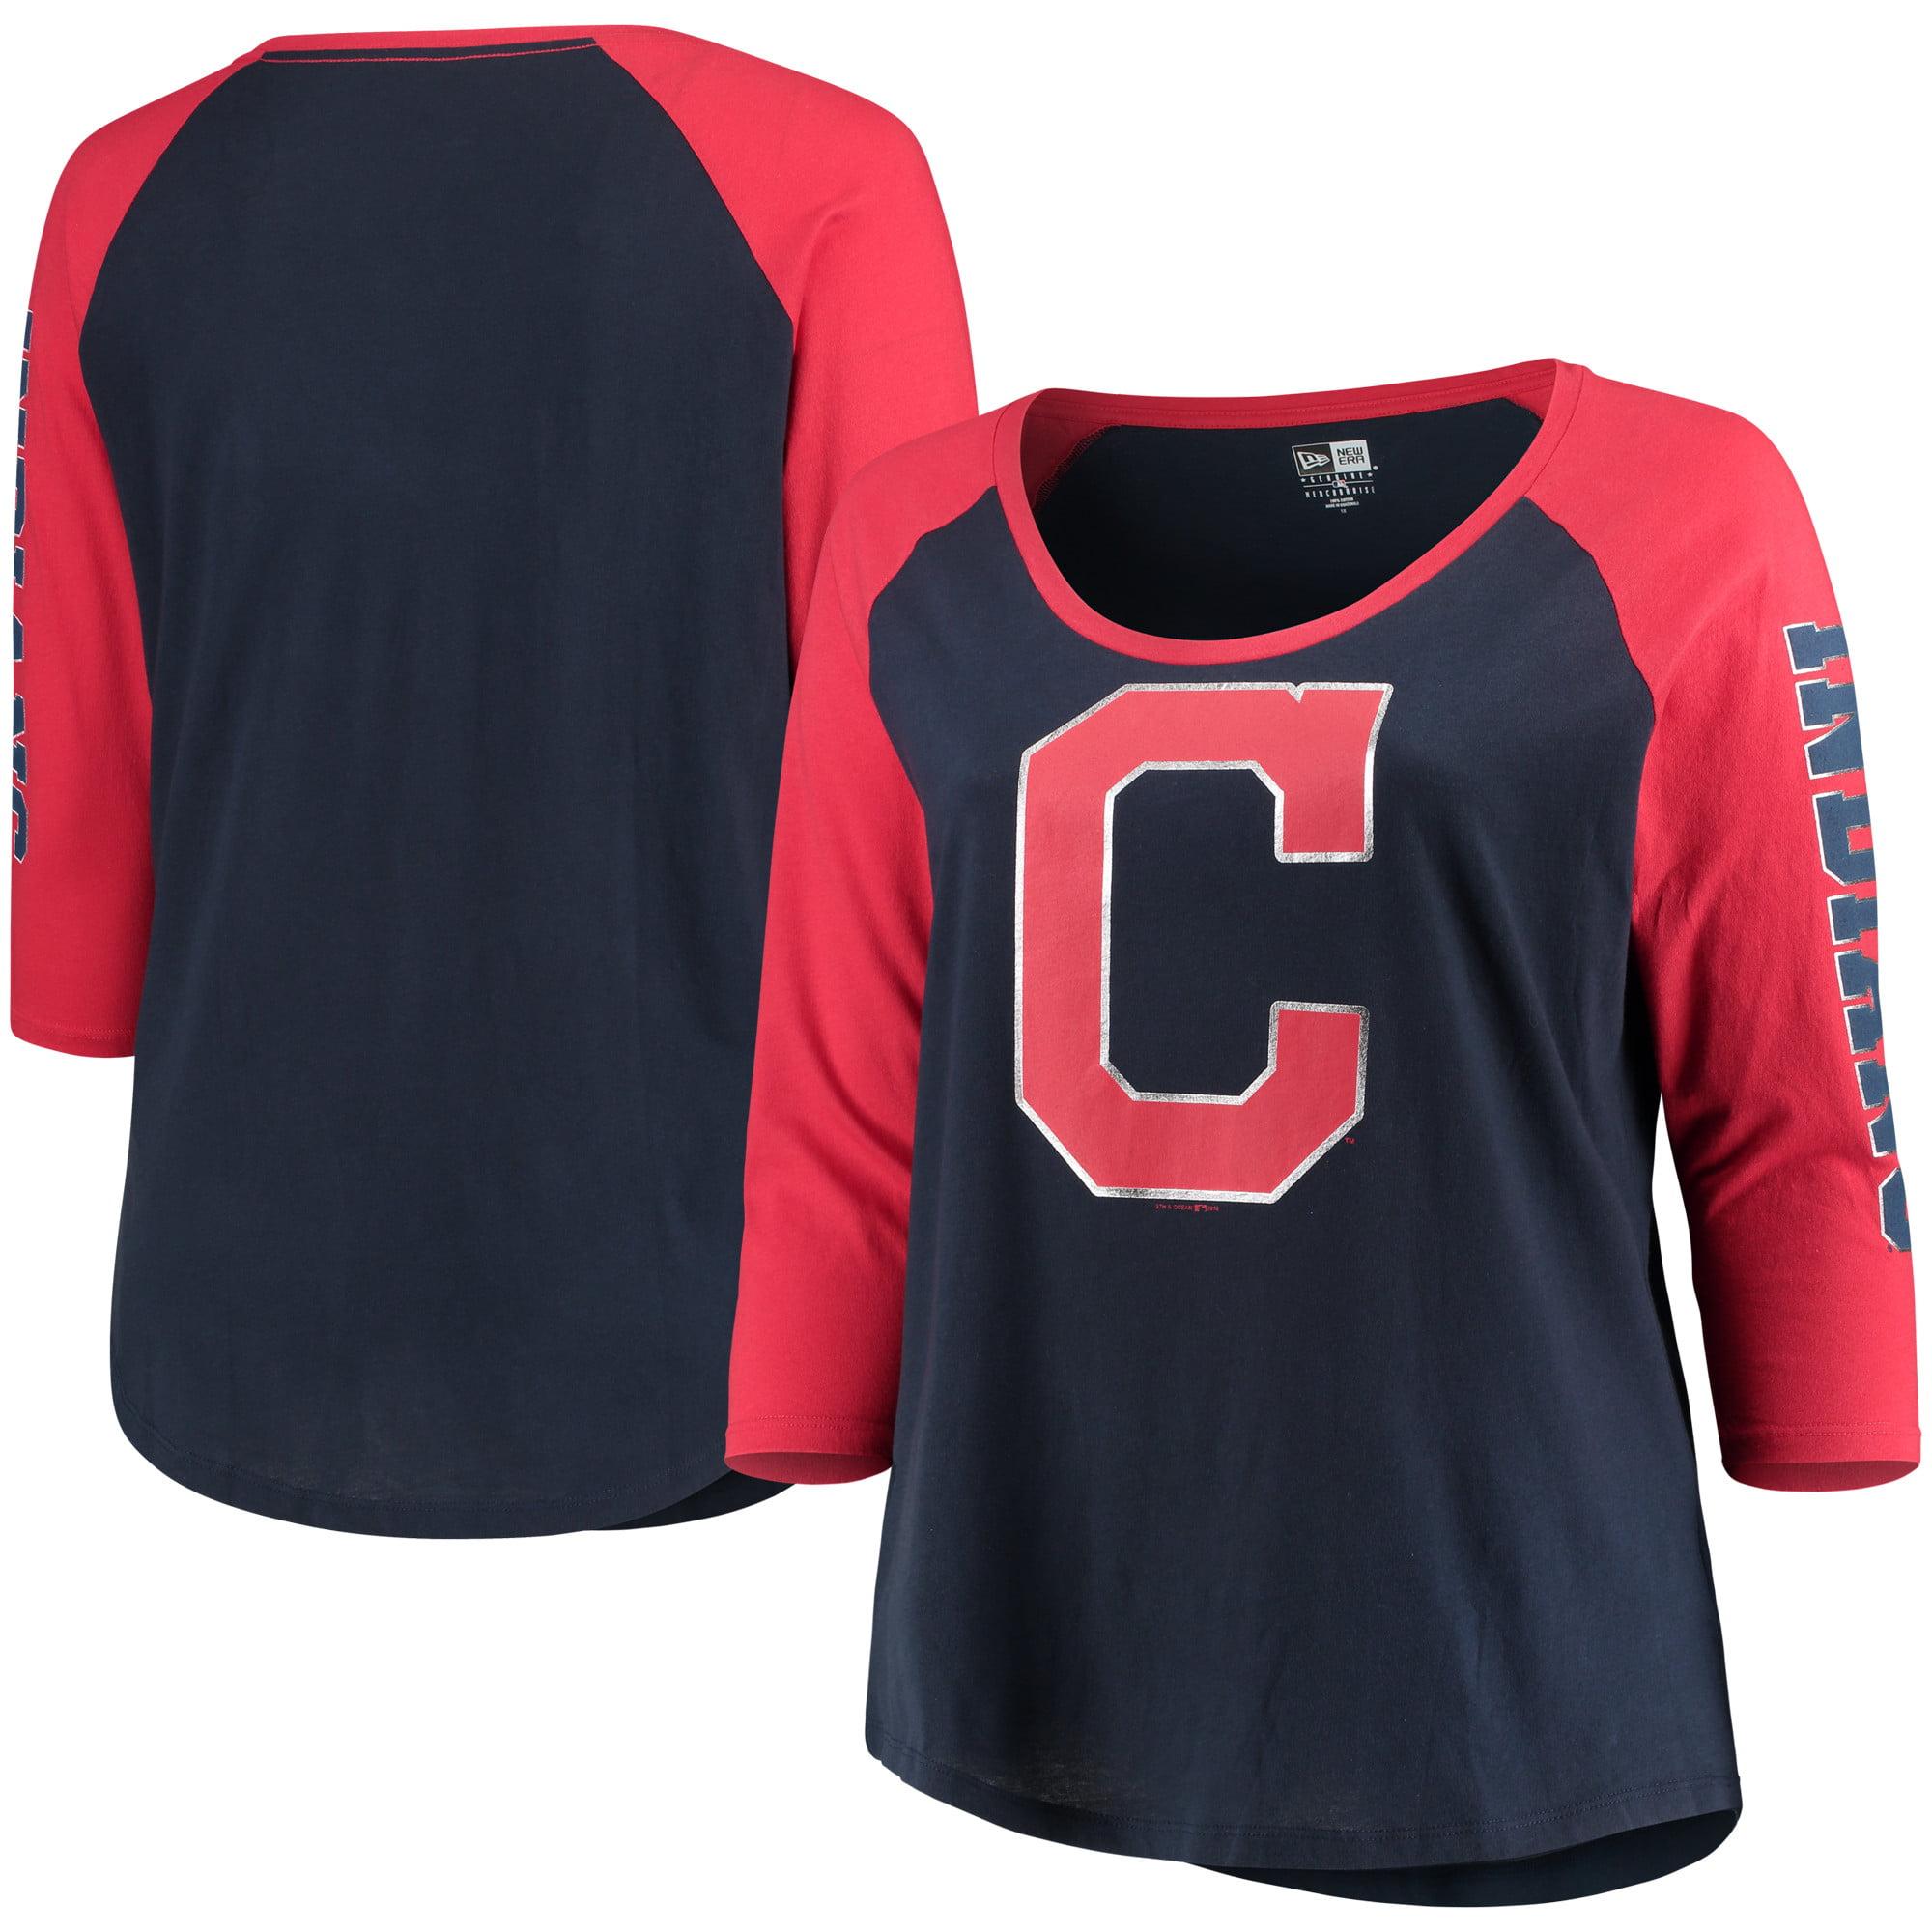 Cleveland Indians 5th   Ocean by New Era Women s Plus Size Foil 3 4-Sleeve  Scoop Neck T-Shirt - Navy Red - Walmart.com a63a6982d